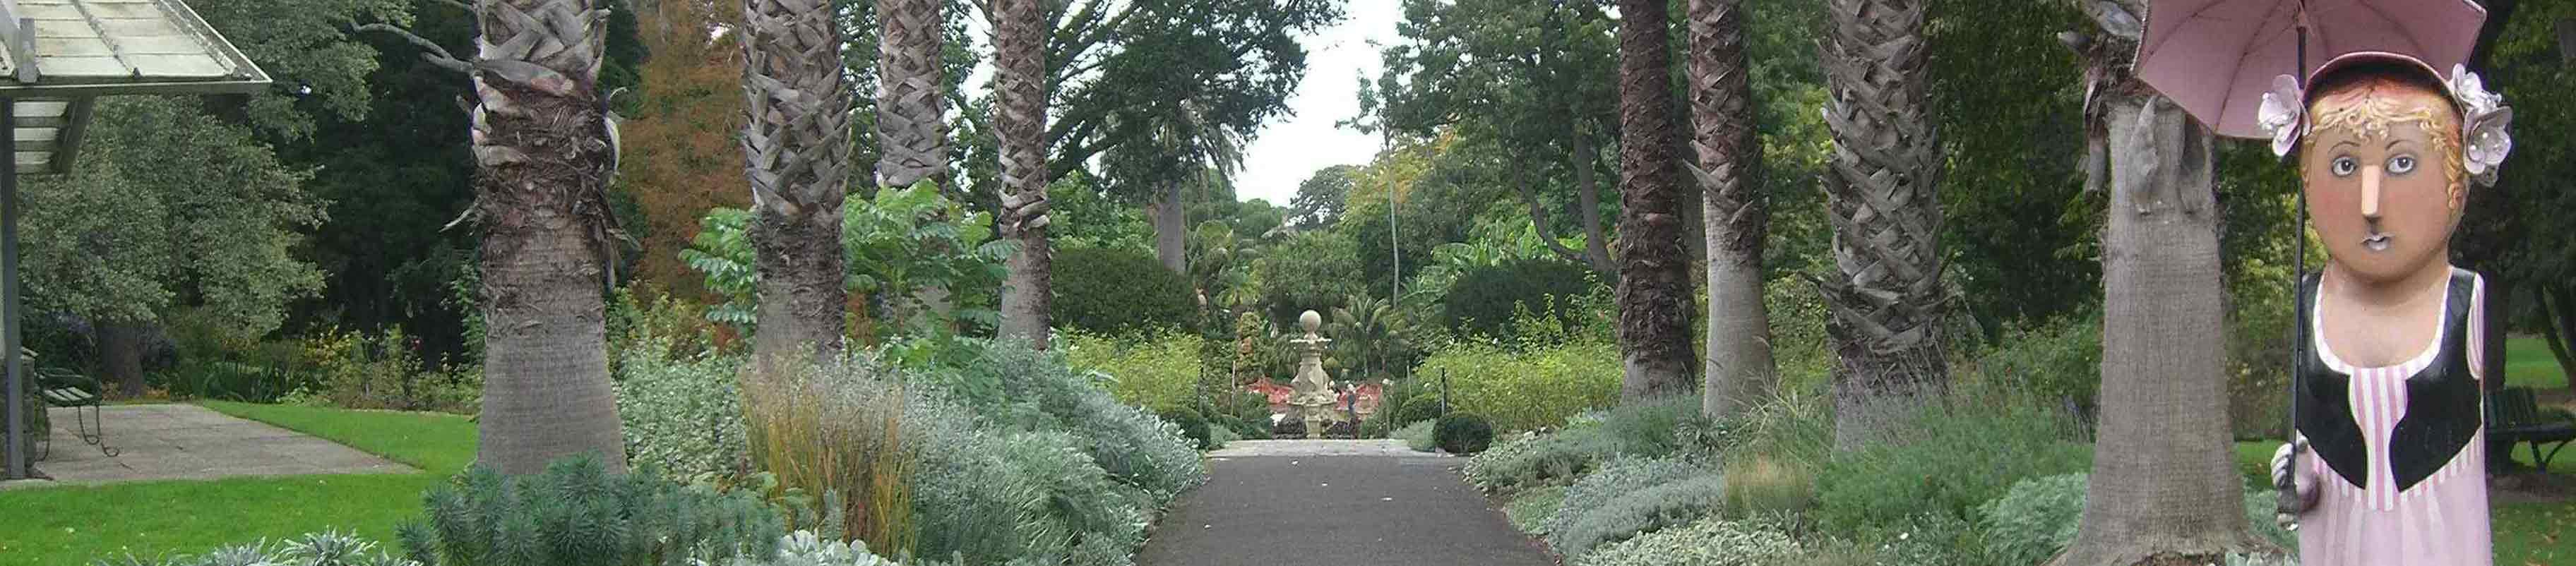 Browse galleriesDiscovering the Gardens   Friends Geelong Botanic Gardens. Garden Stores Geelong. Home Design Ideas